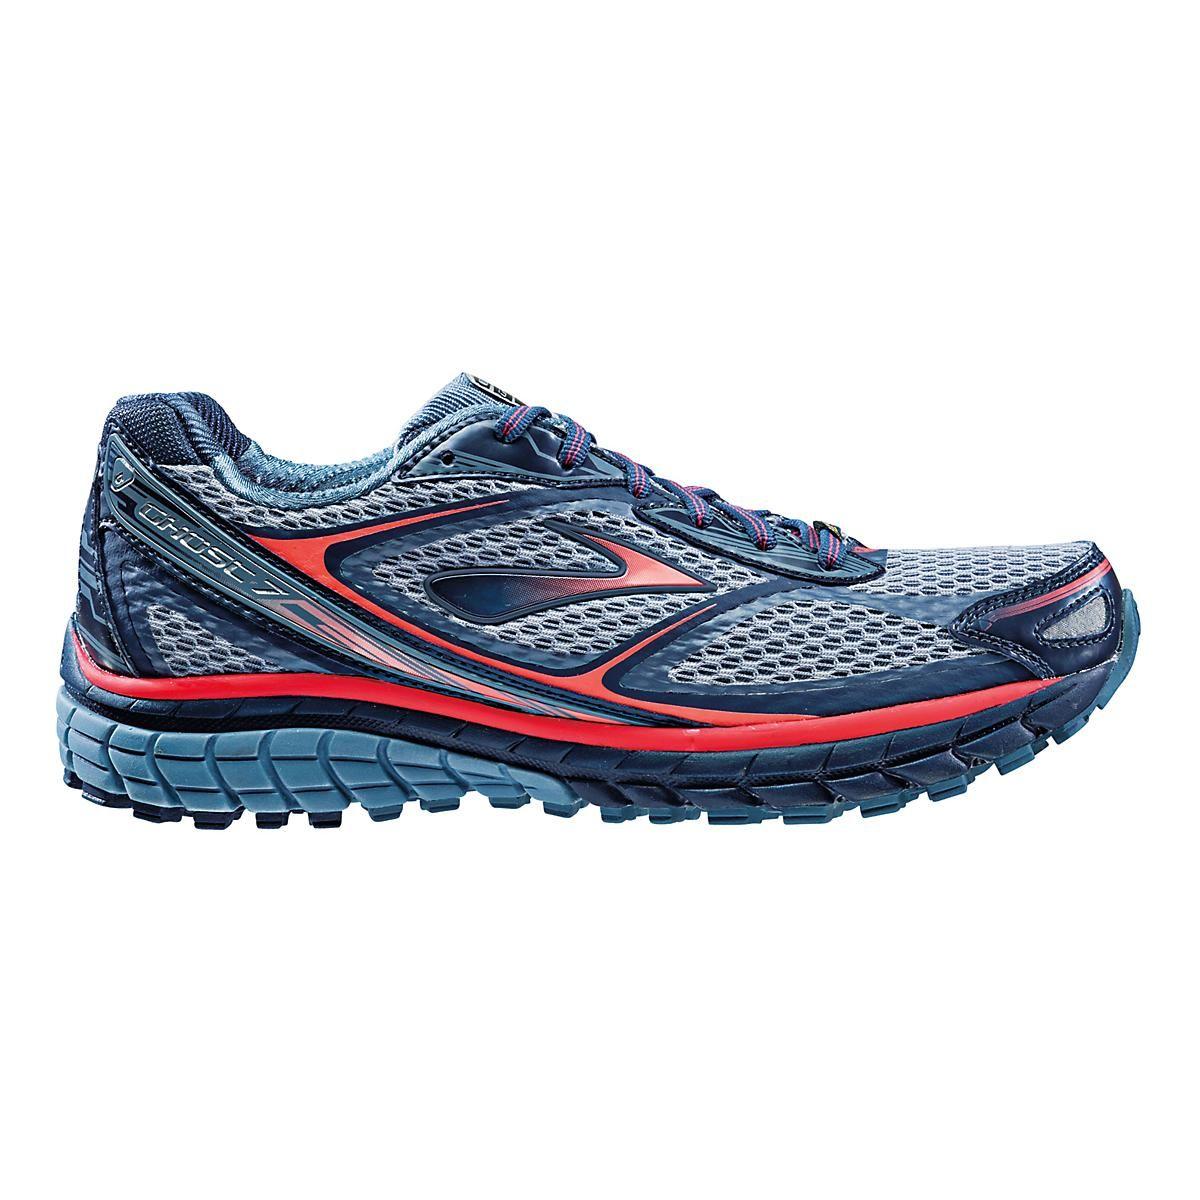 Ghost 7 GTX | Gore tex running shoes